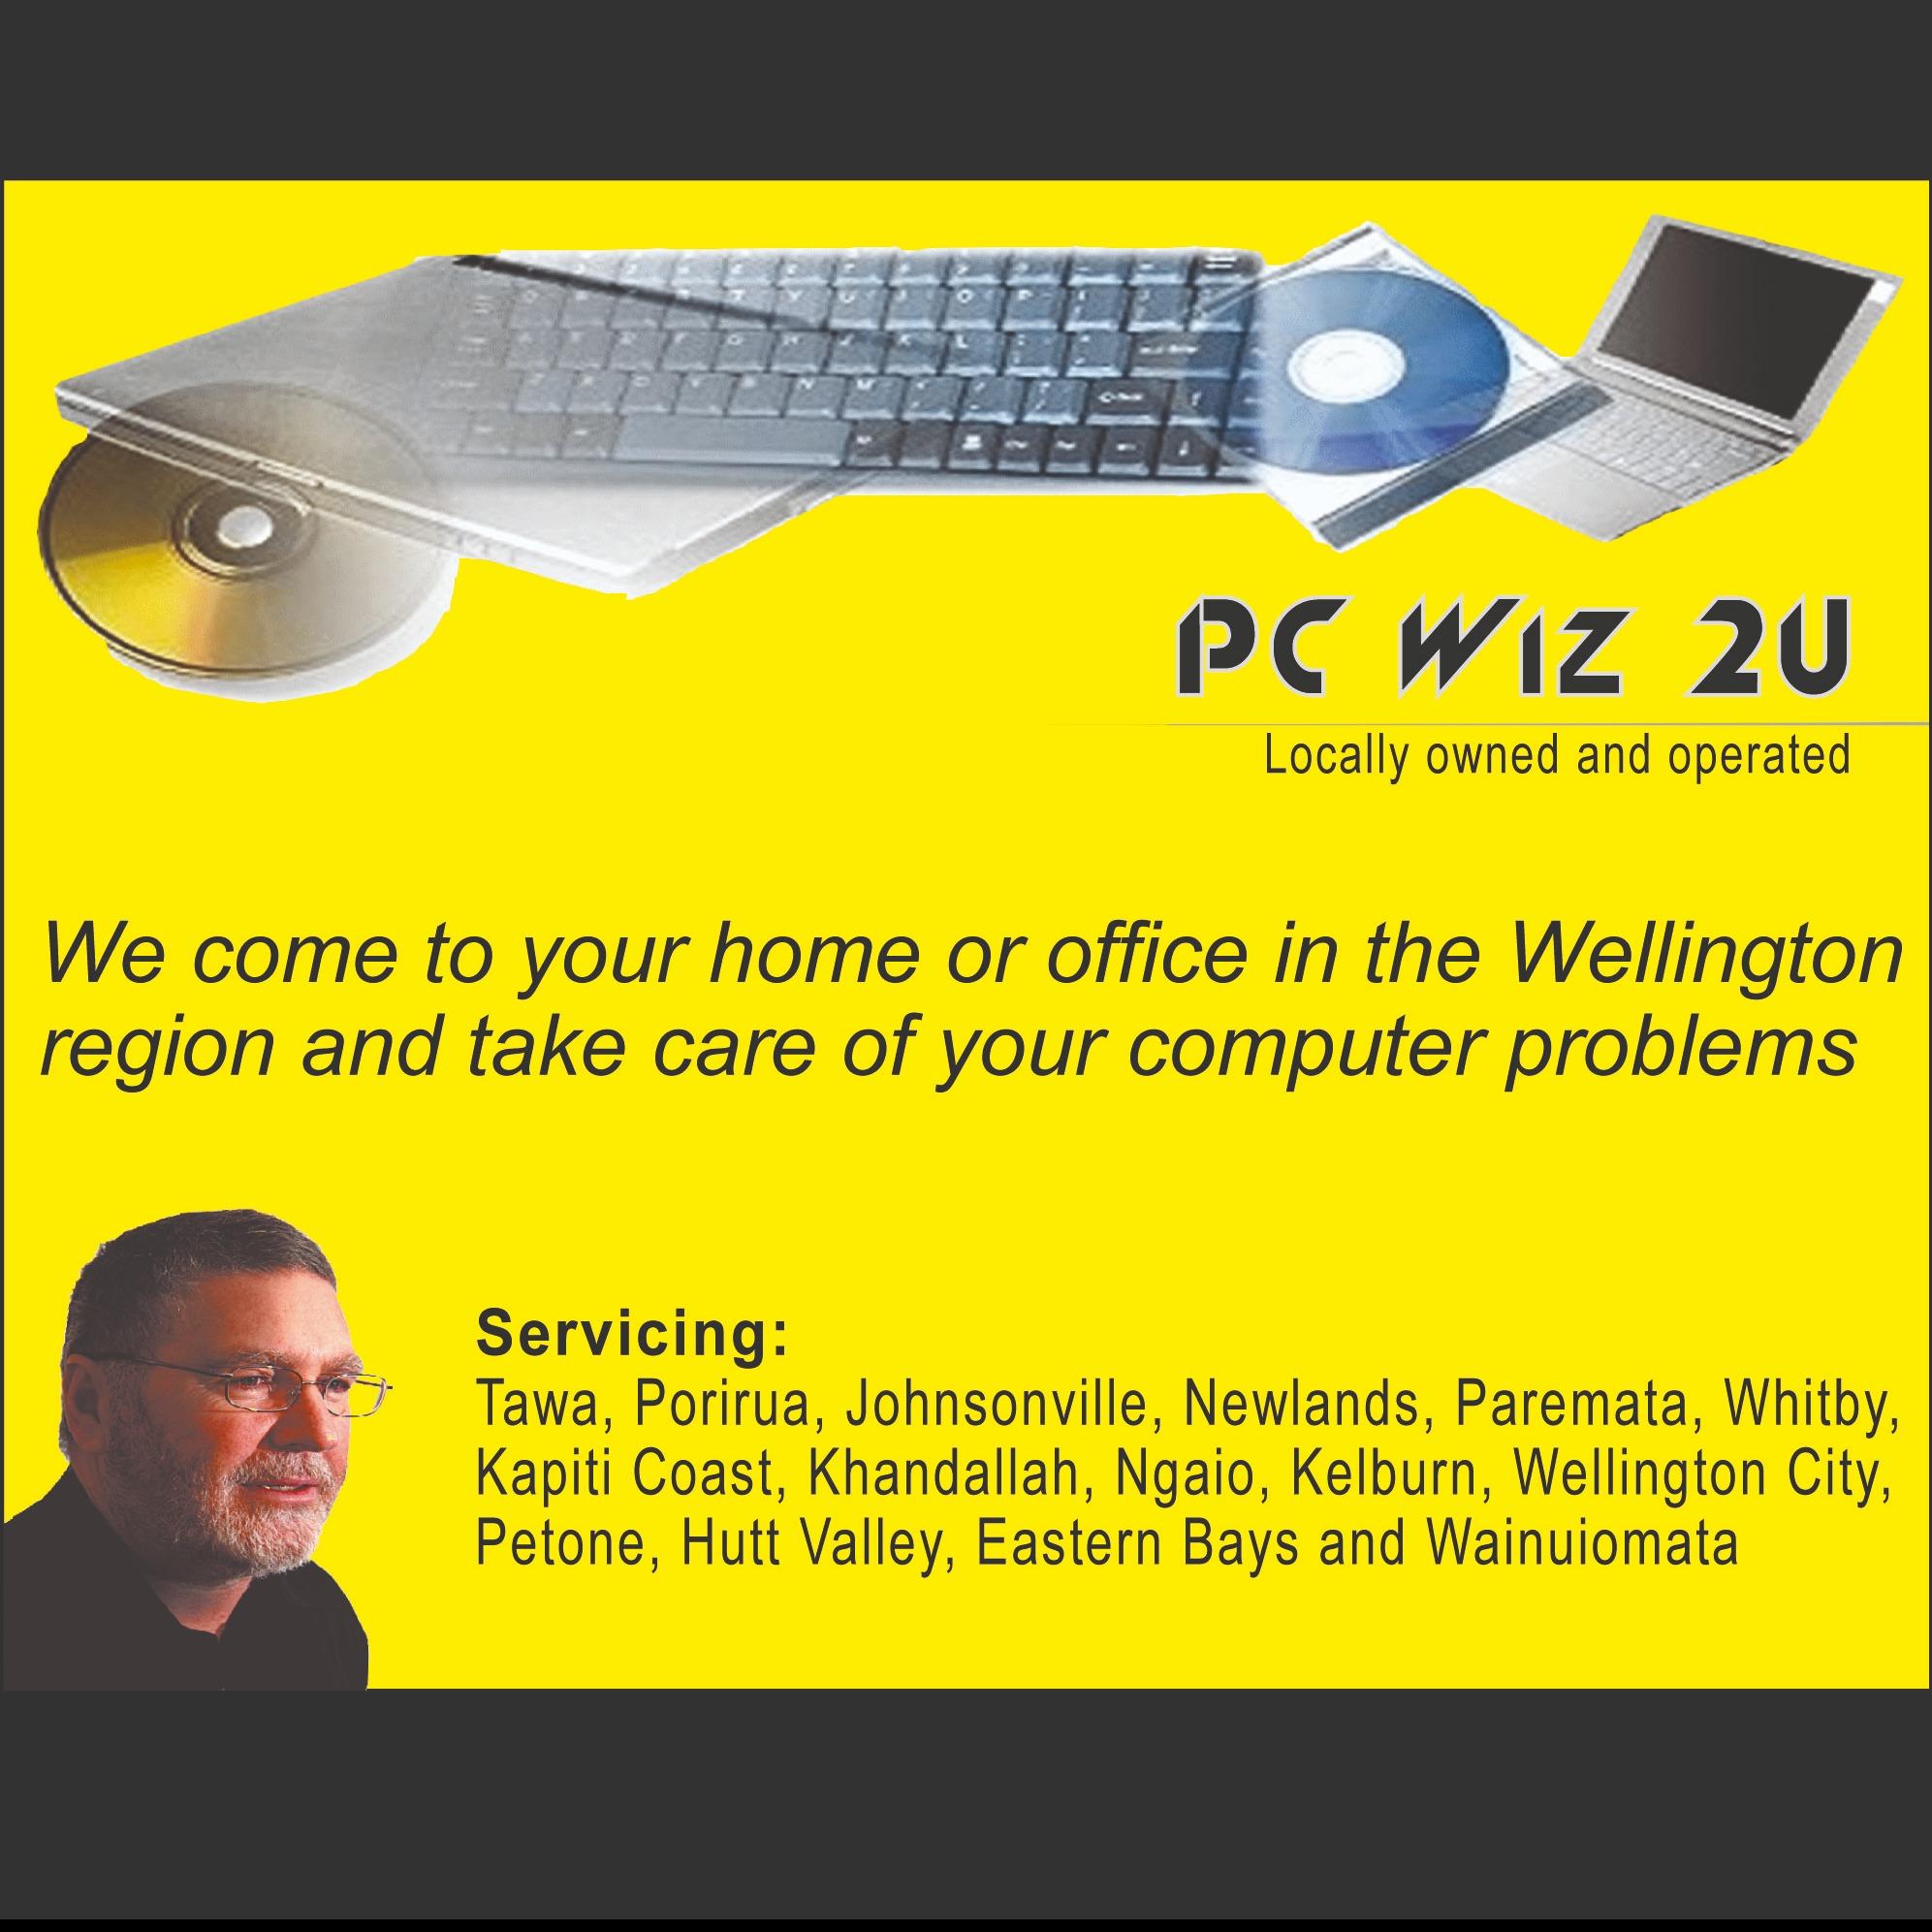 PC Wiz 2U Ltd | Home Calls for Computers